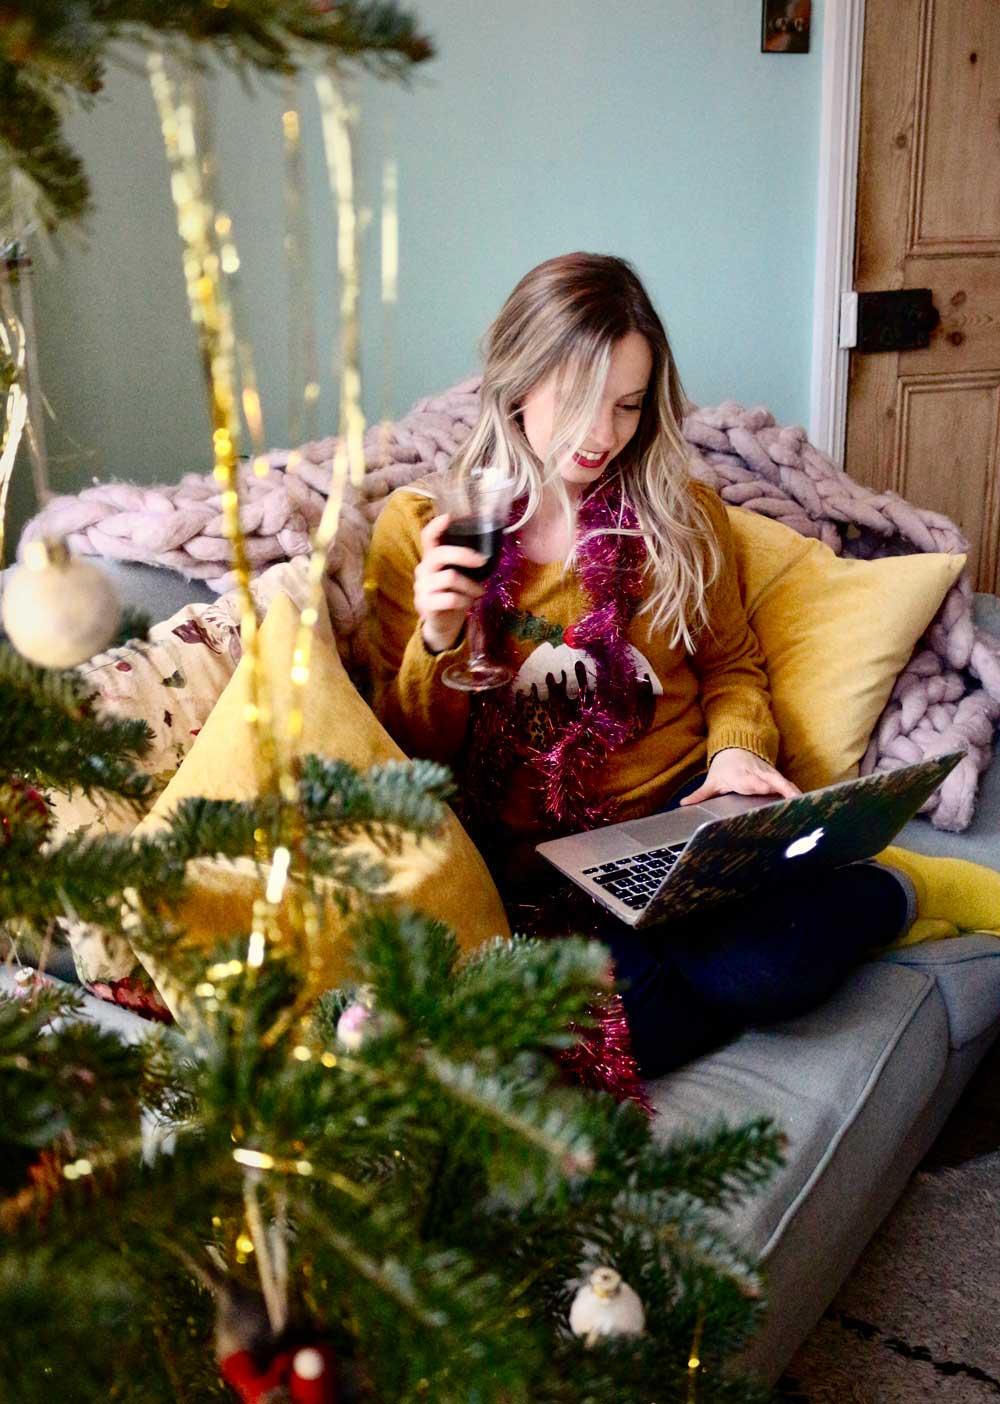 A very merry socially distanced Christmas